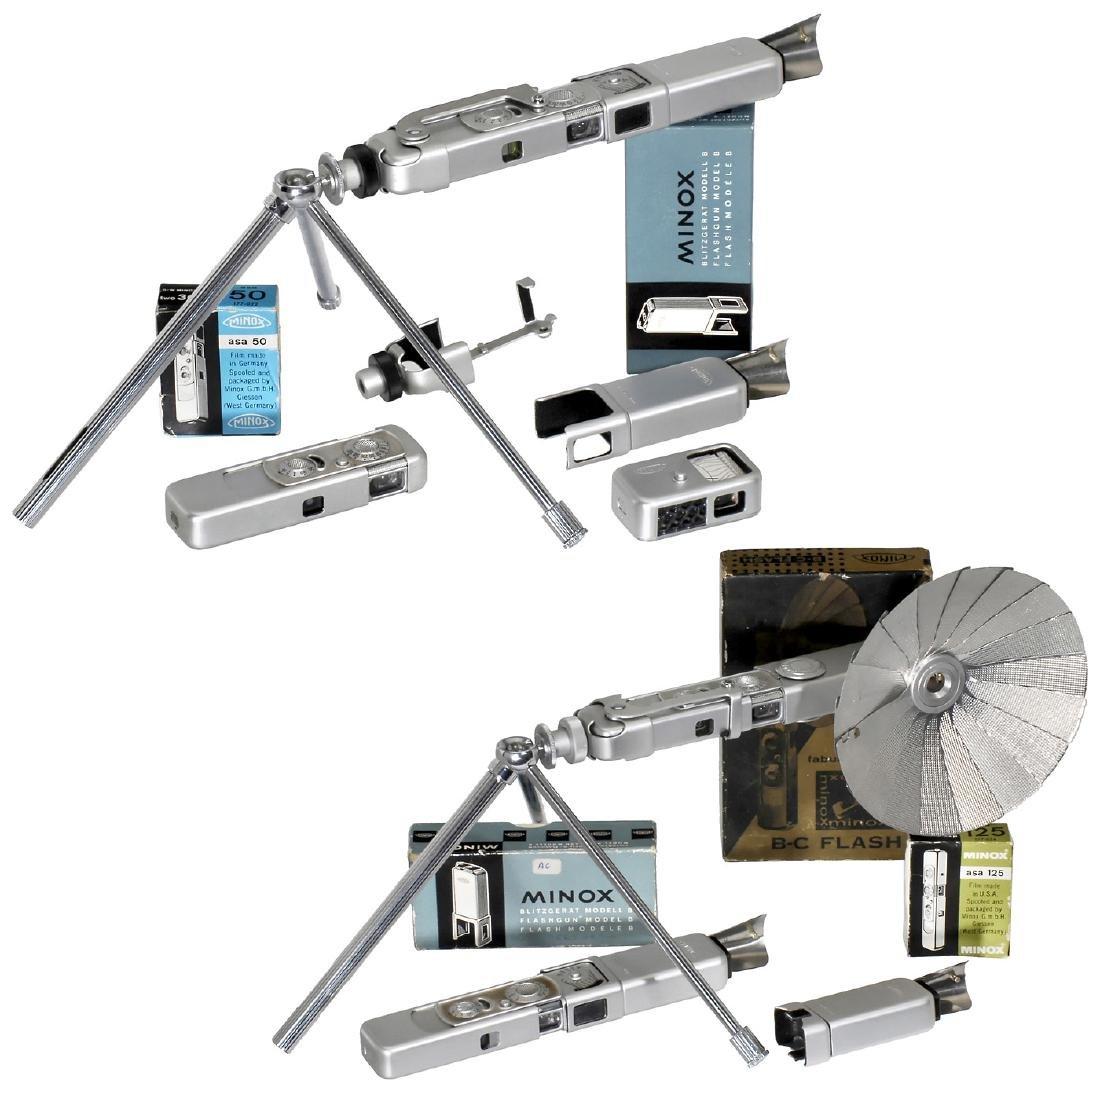 Minox Cameras and Accessories